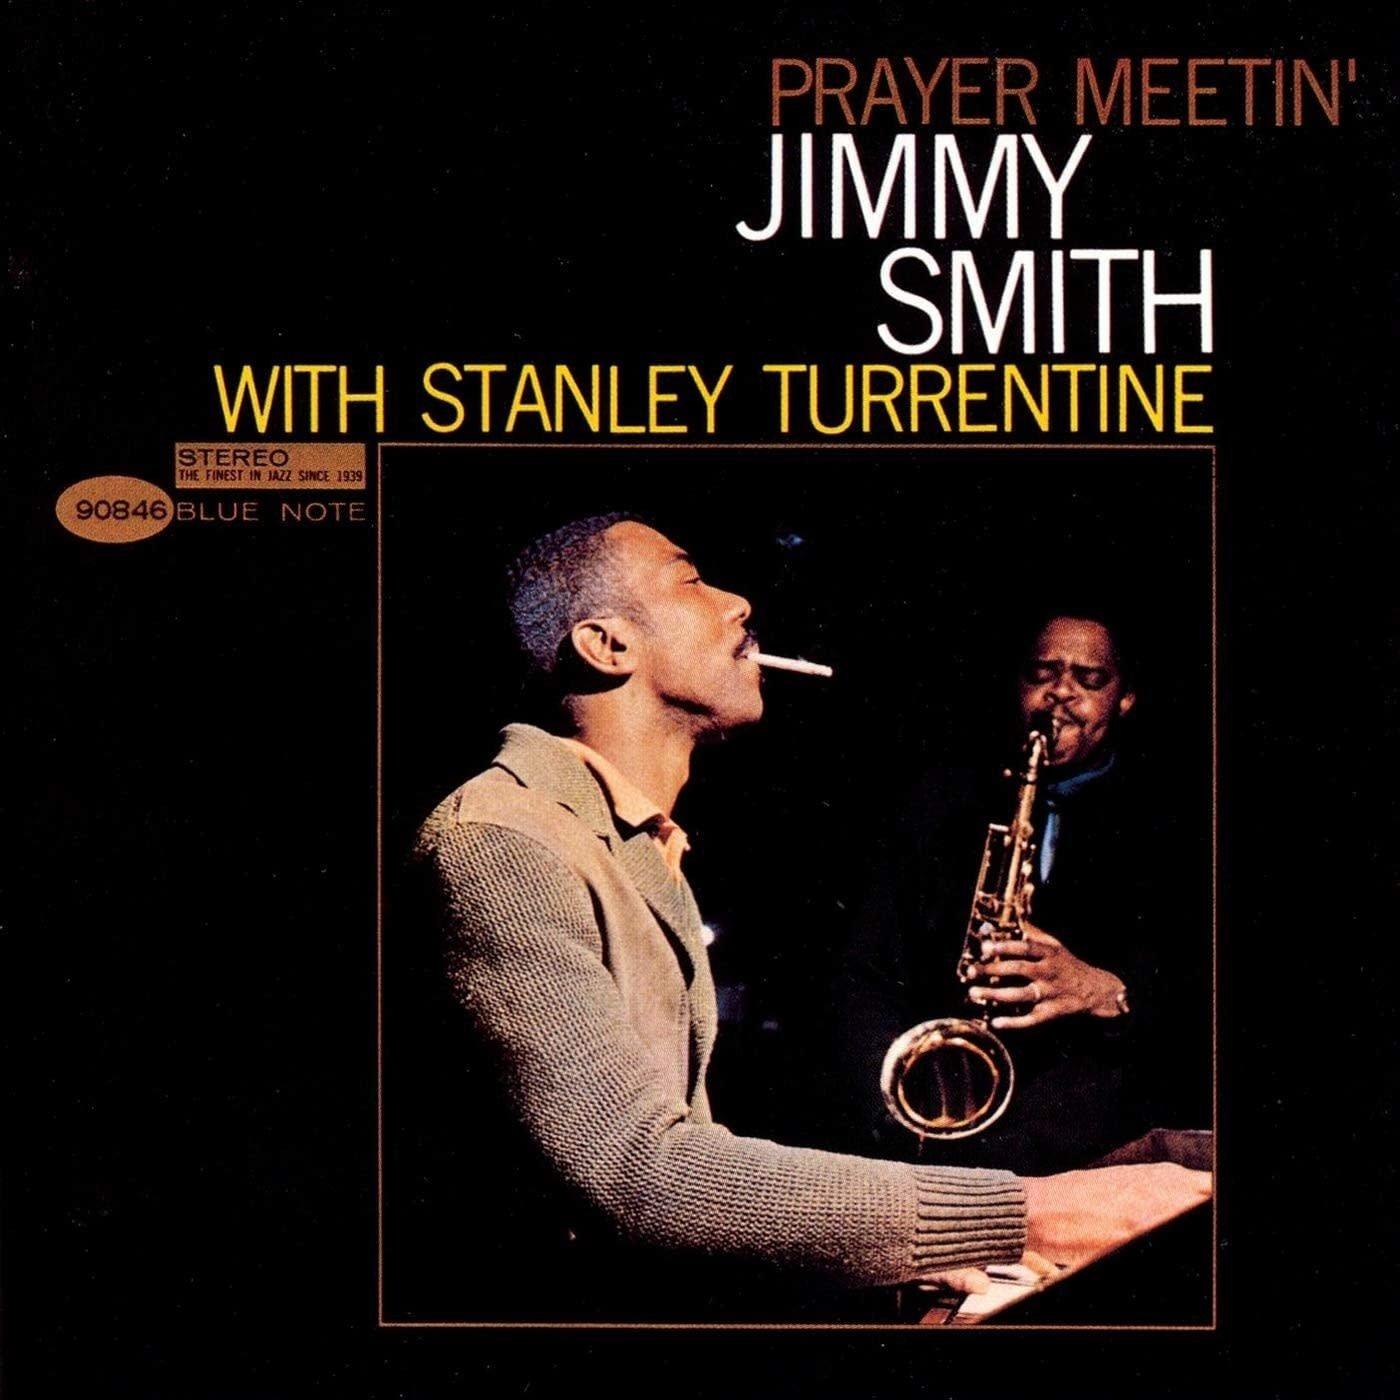 Jimmy Smith - Prayer Meetin'